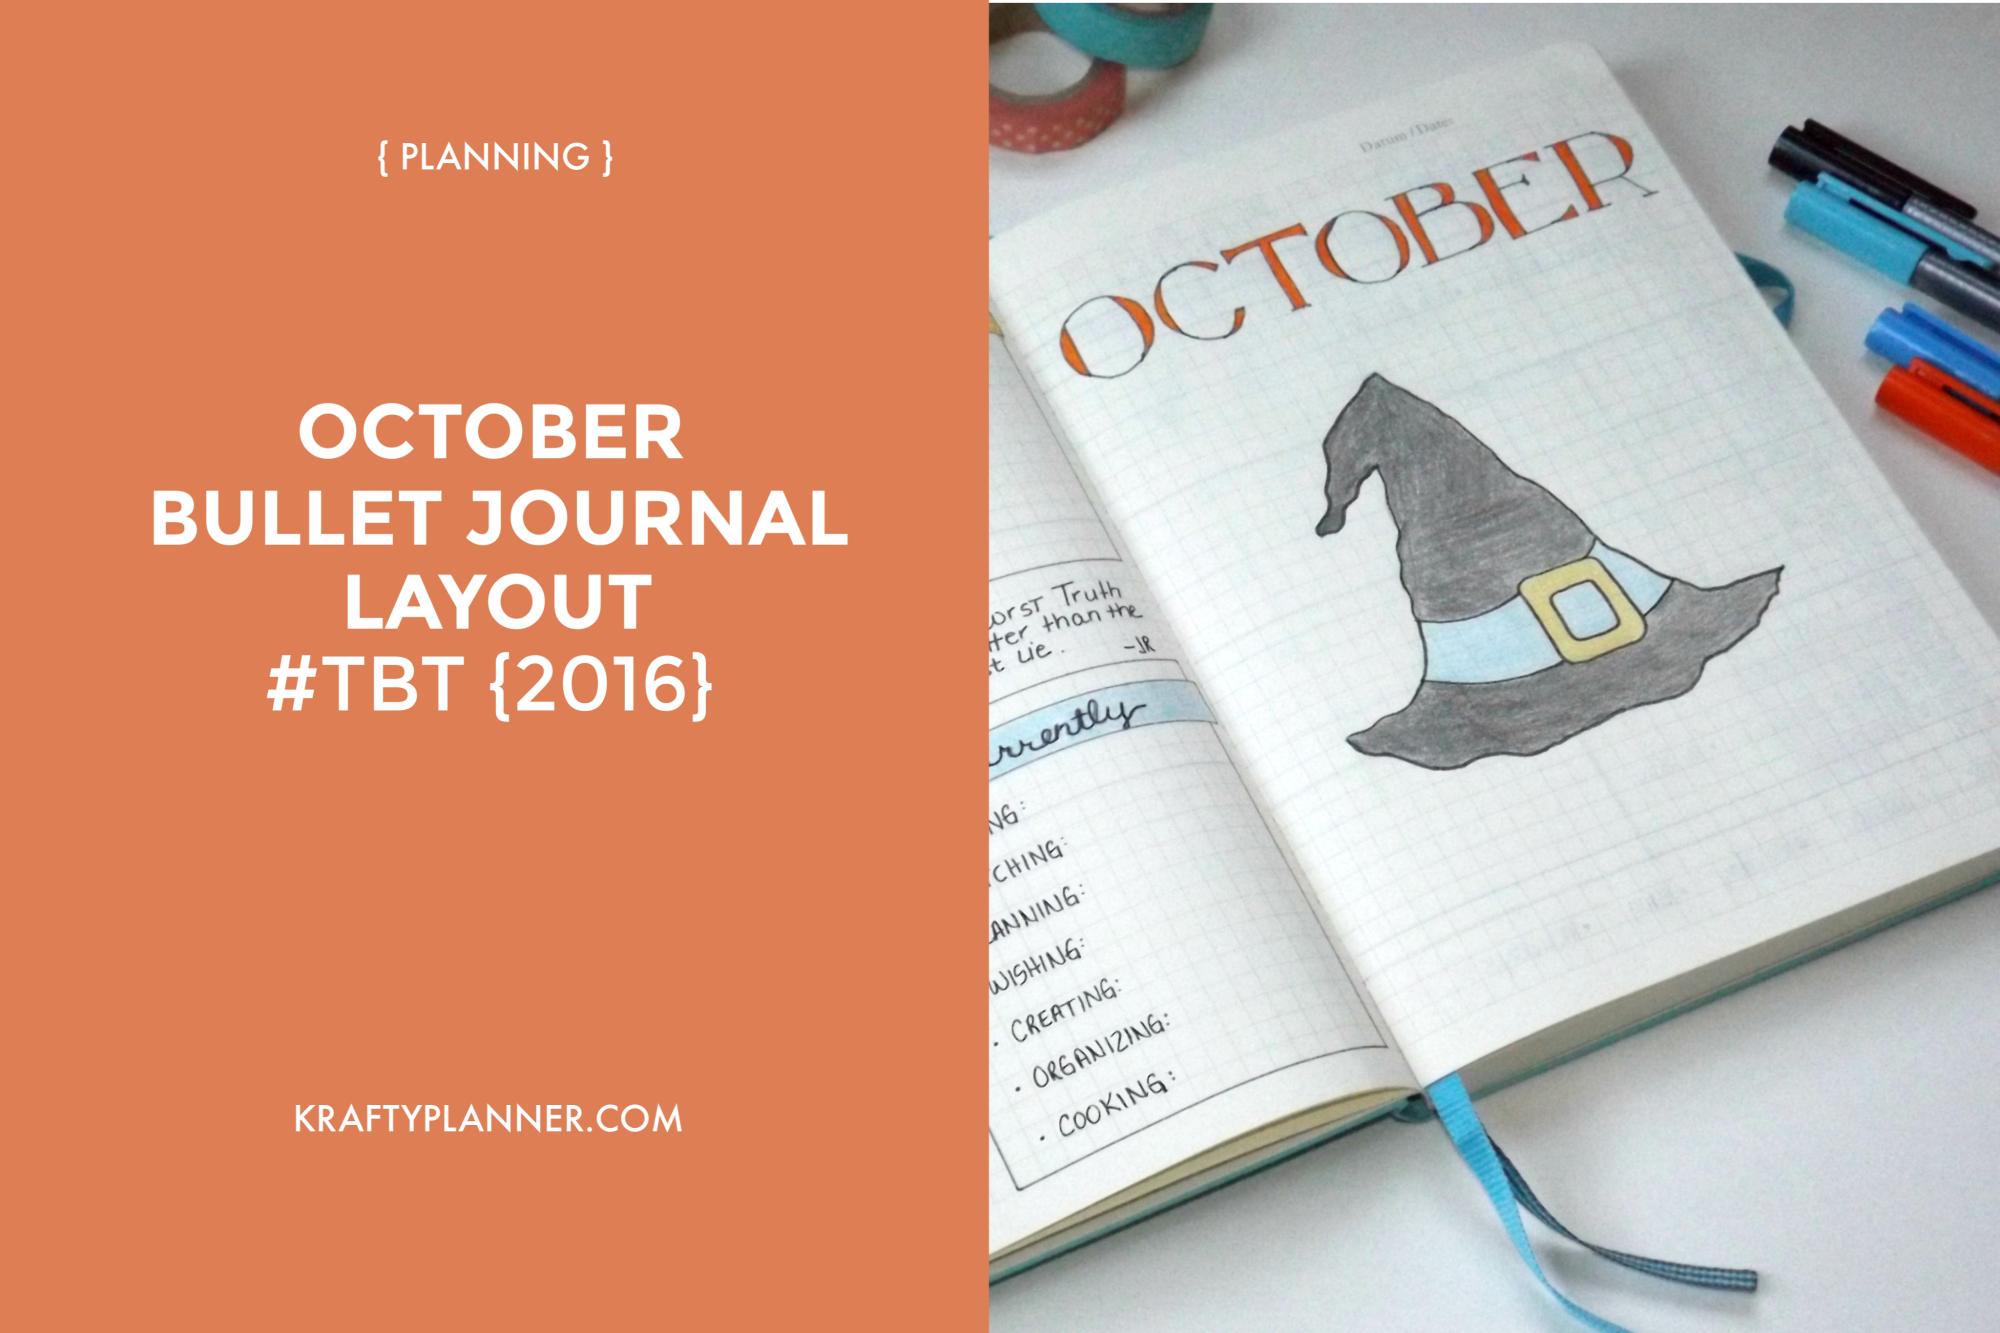 October bullet journal layout, #TBT 2016.png